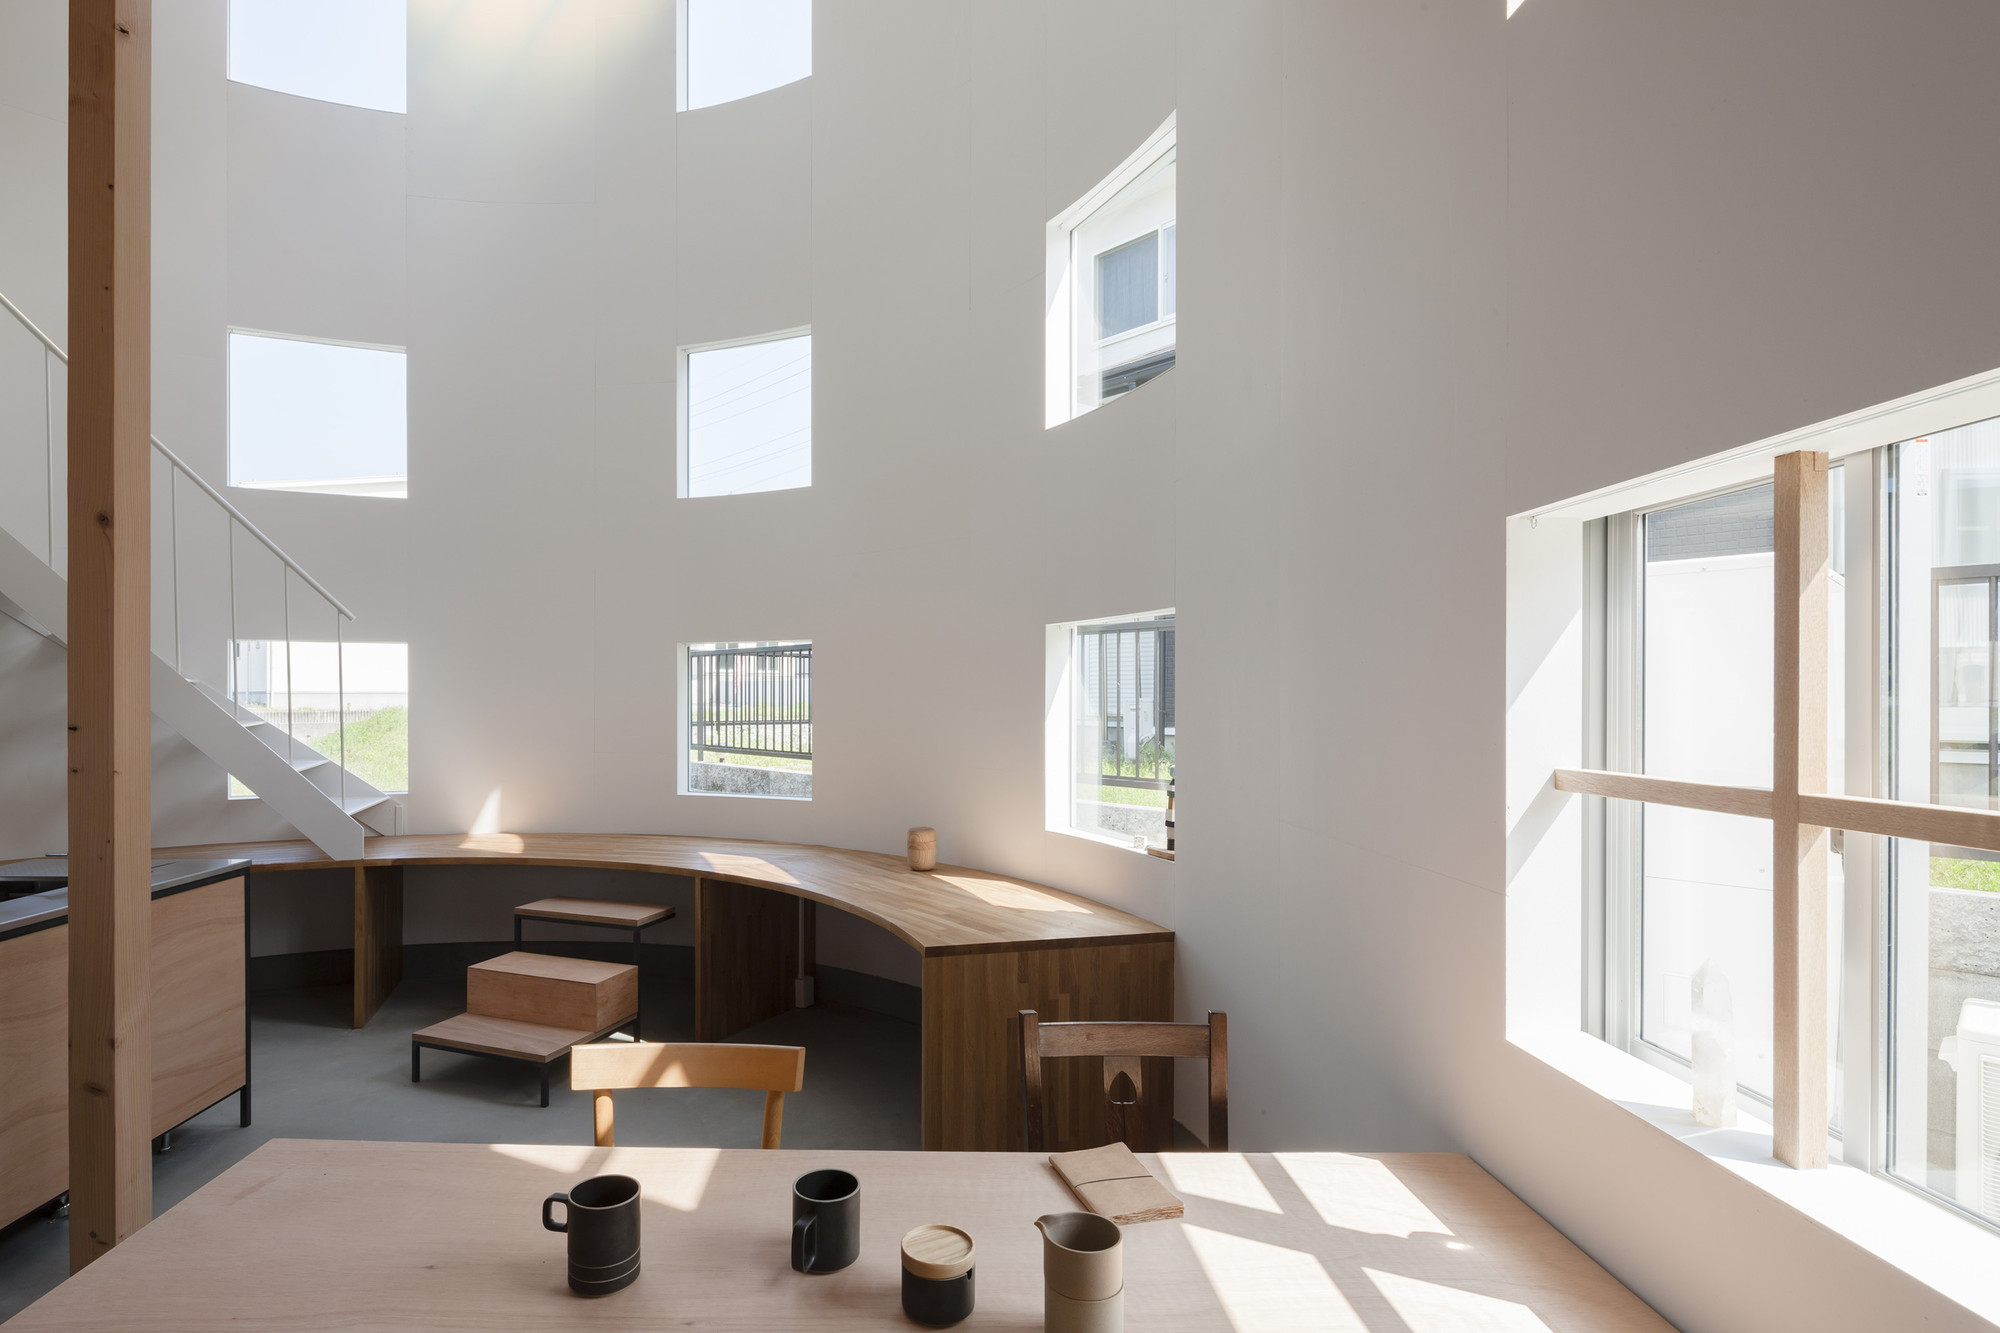 House in Hikone / Tato Architects, © Shinkenchiku sha